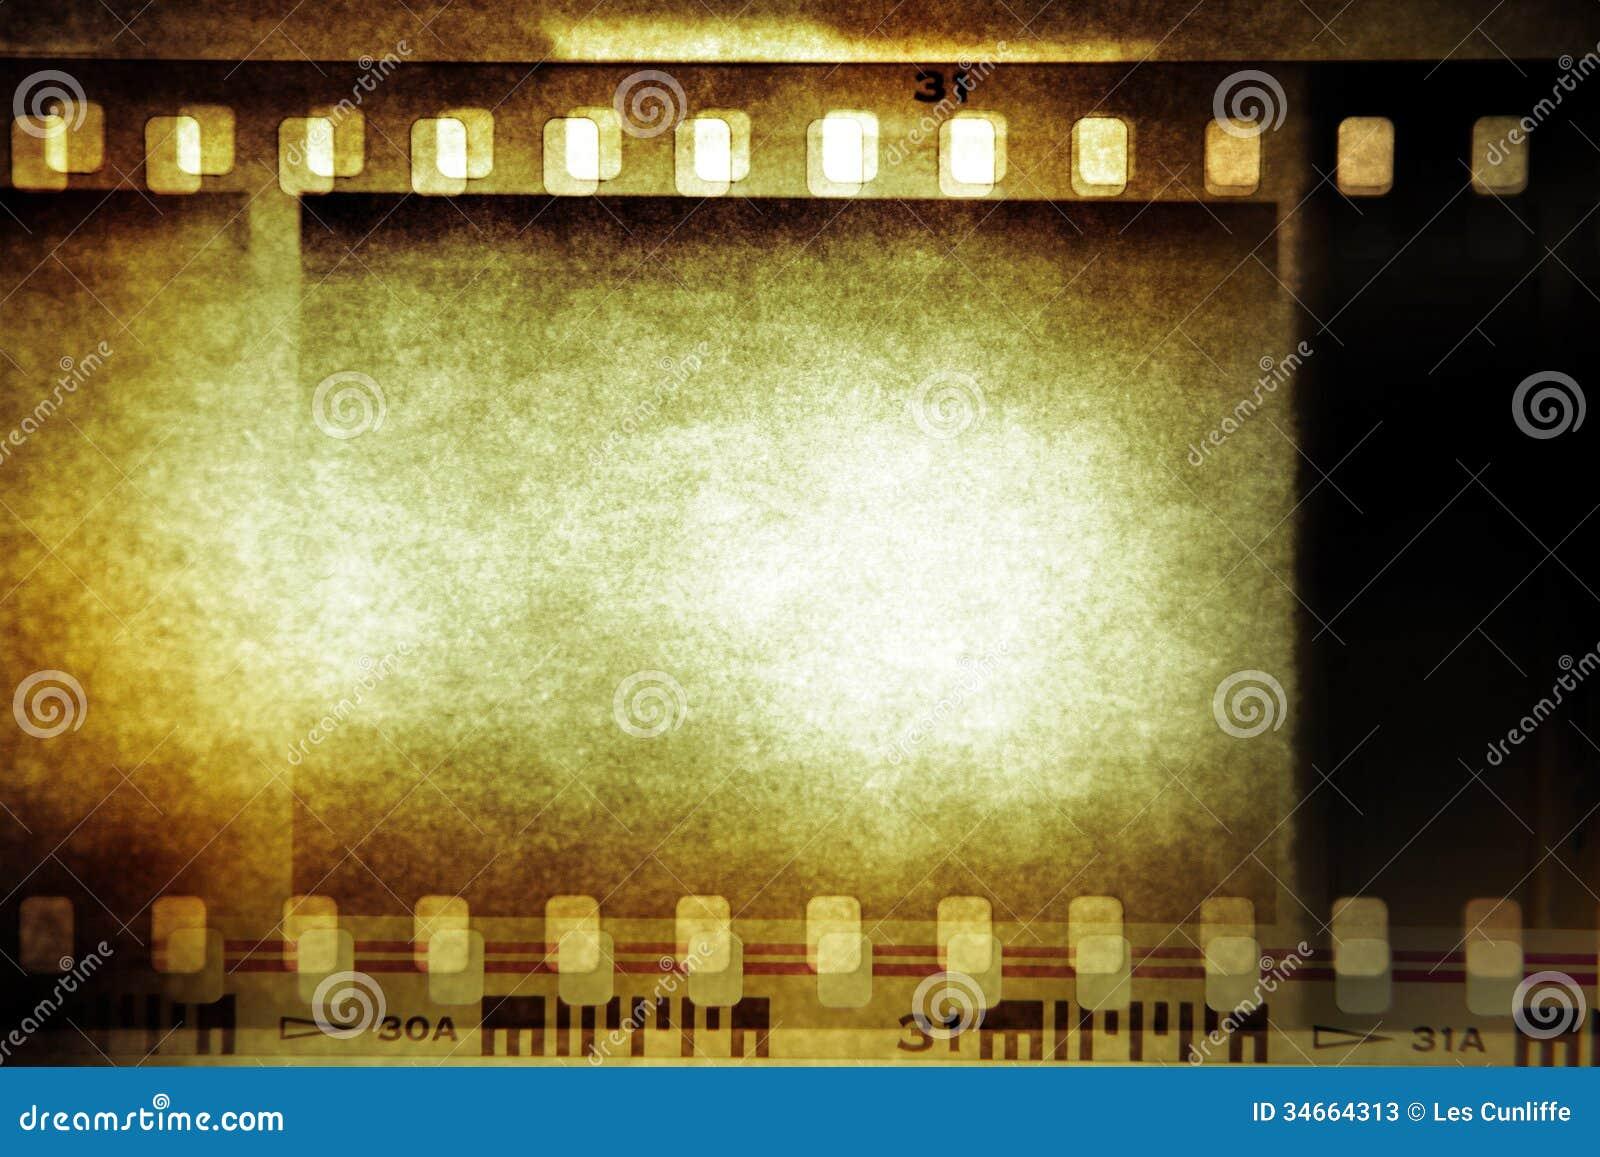 Filmstrip Stock Photos - Image: 34664313